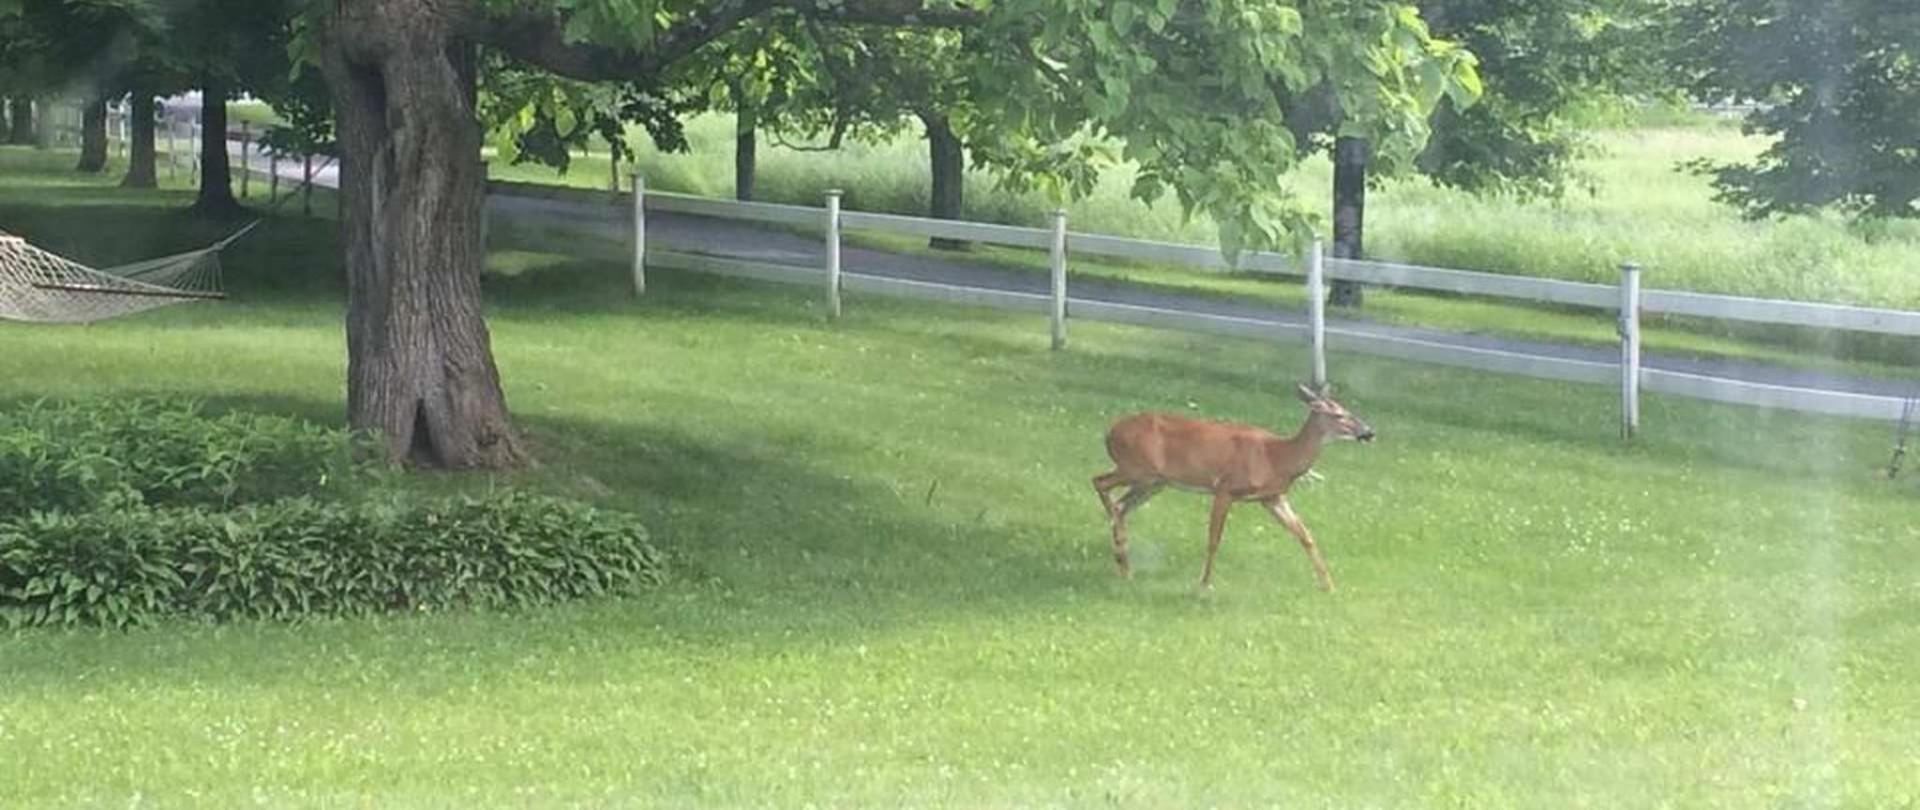 deer-in-front-yard.jpg.1920x810_0_628_20000.jpeg.1920x0.jpeg